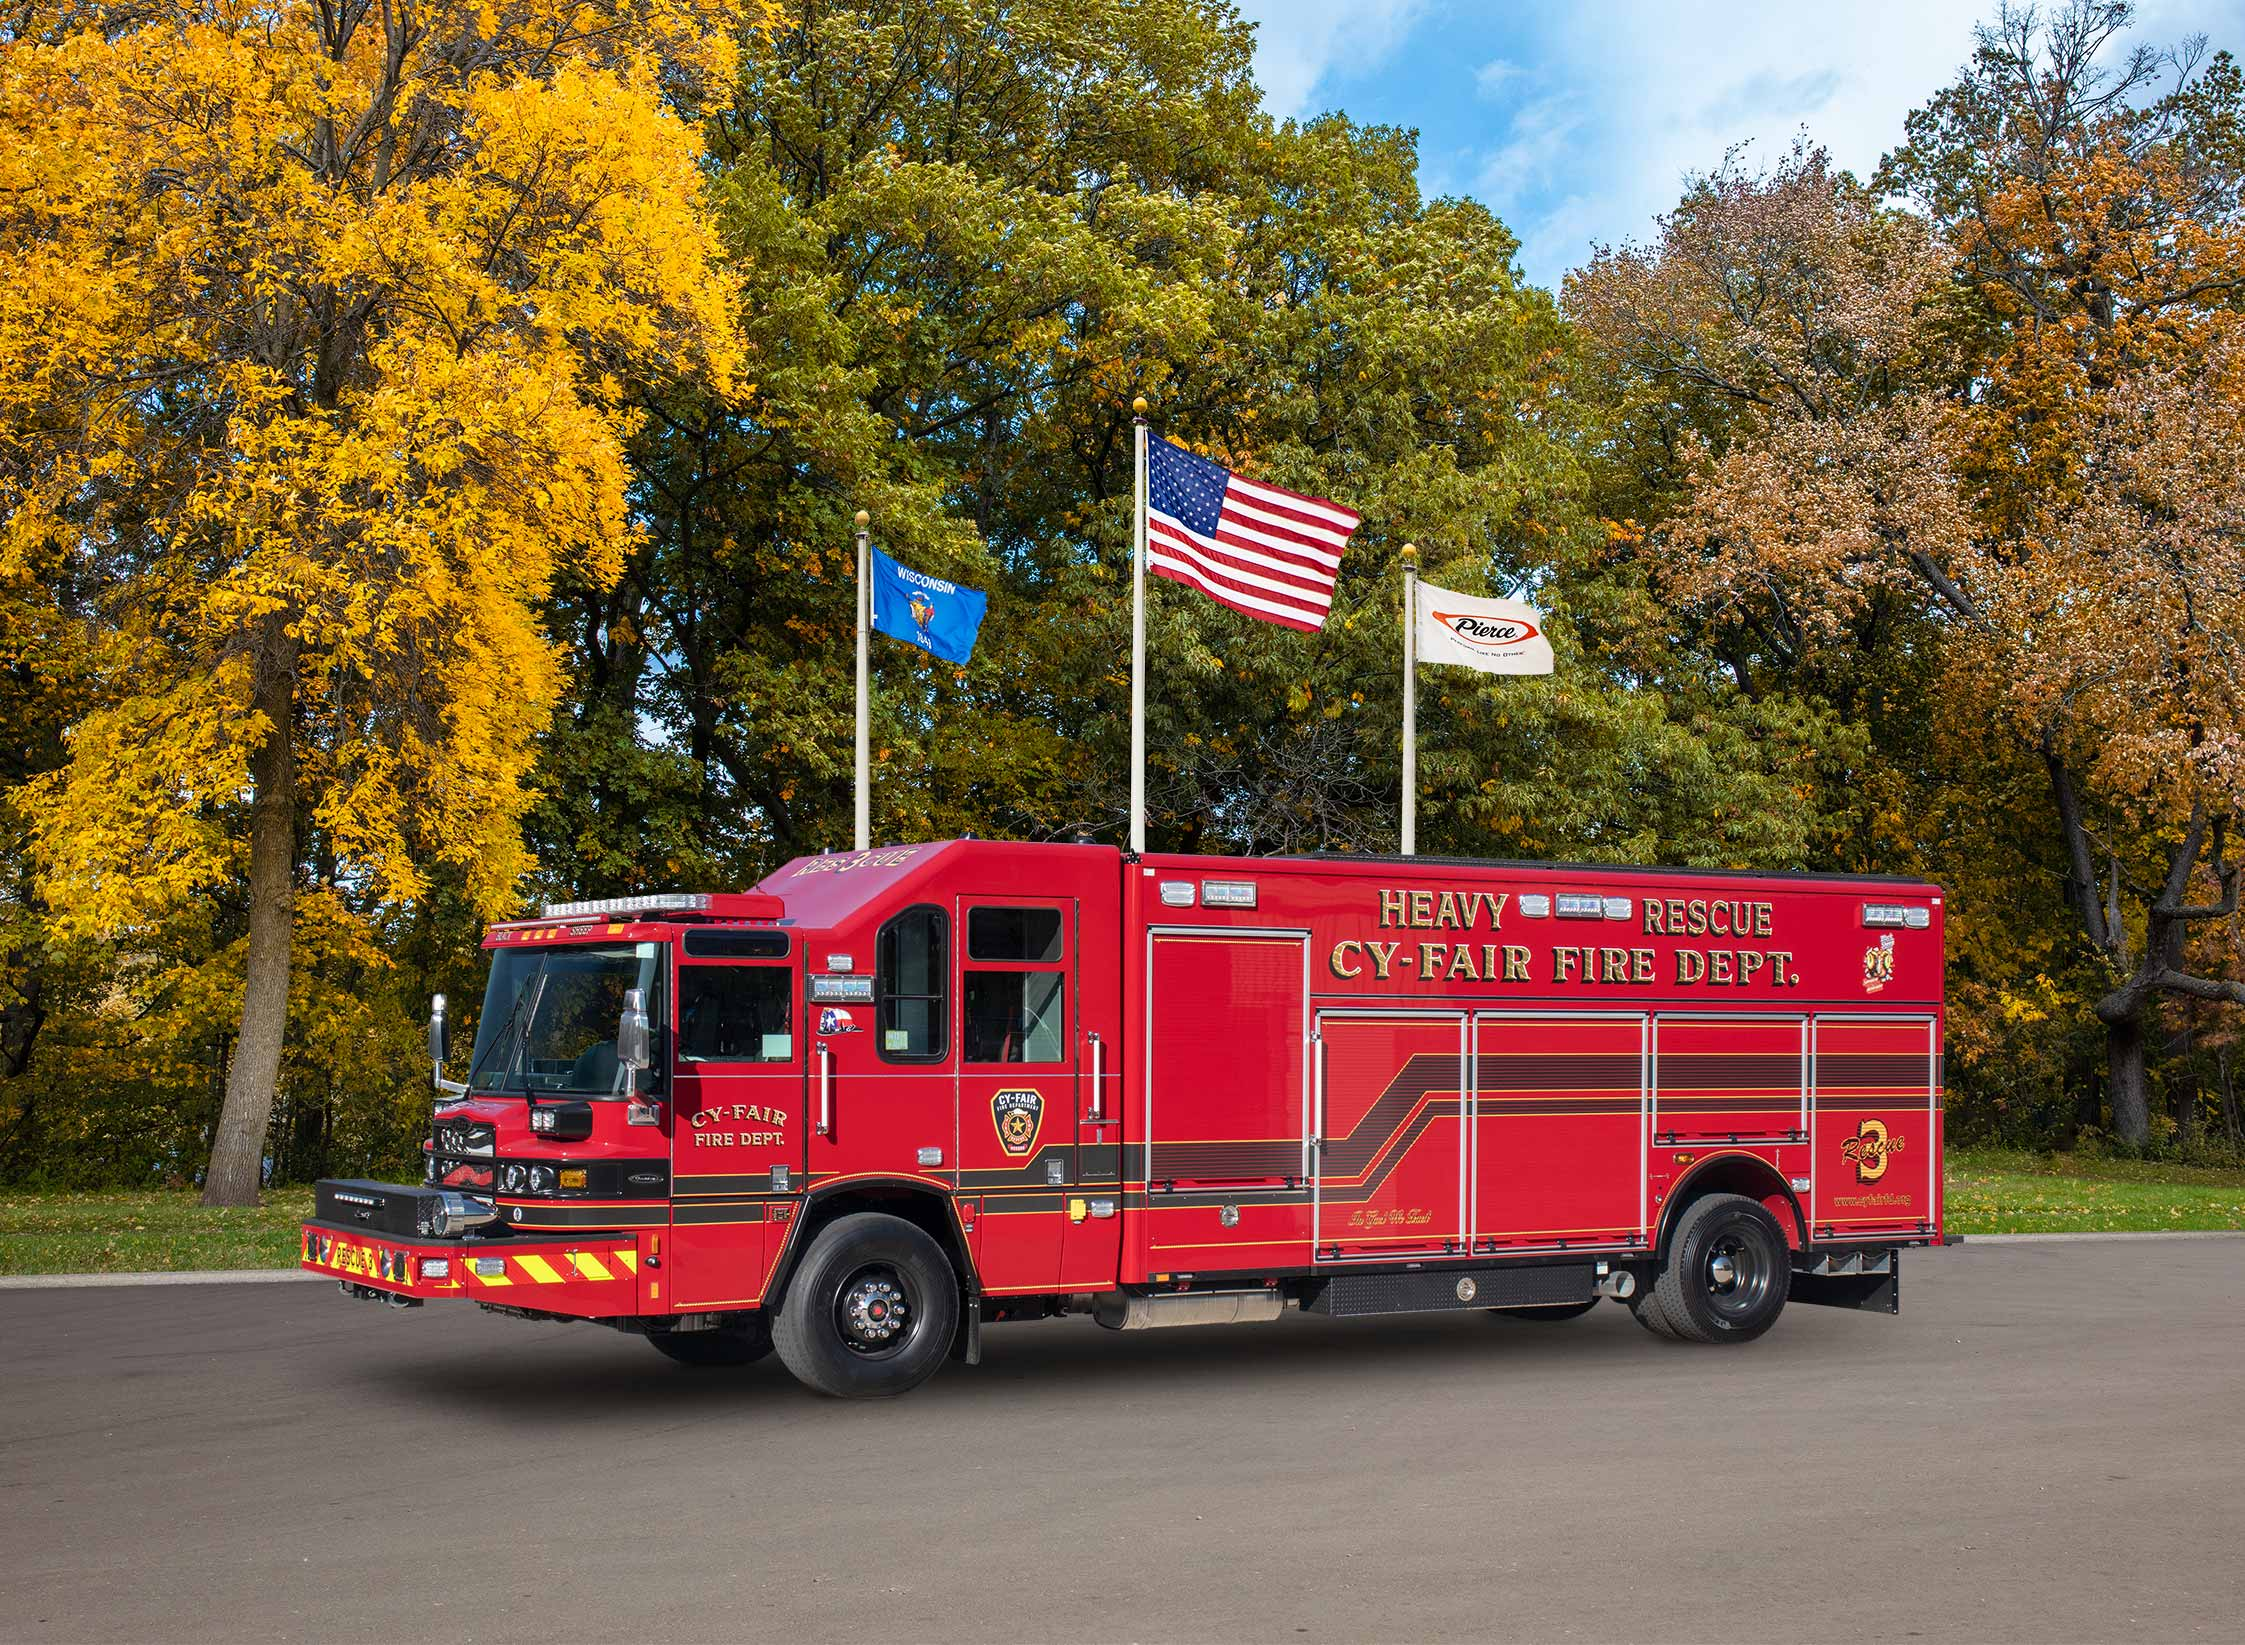 Harris County ESD 9 - Rescue